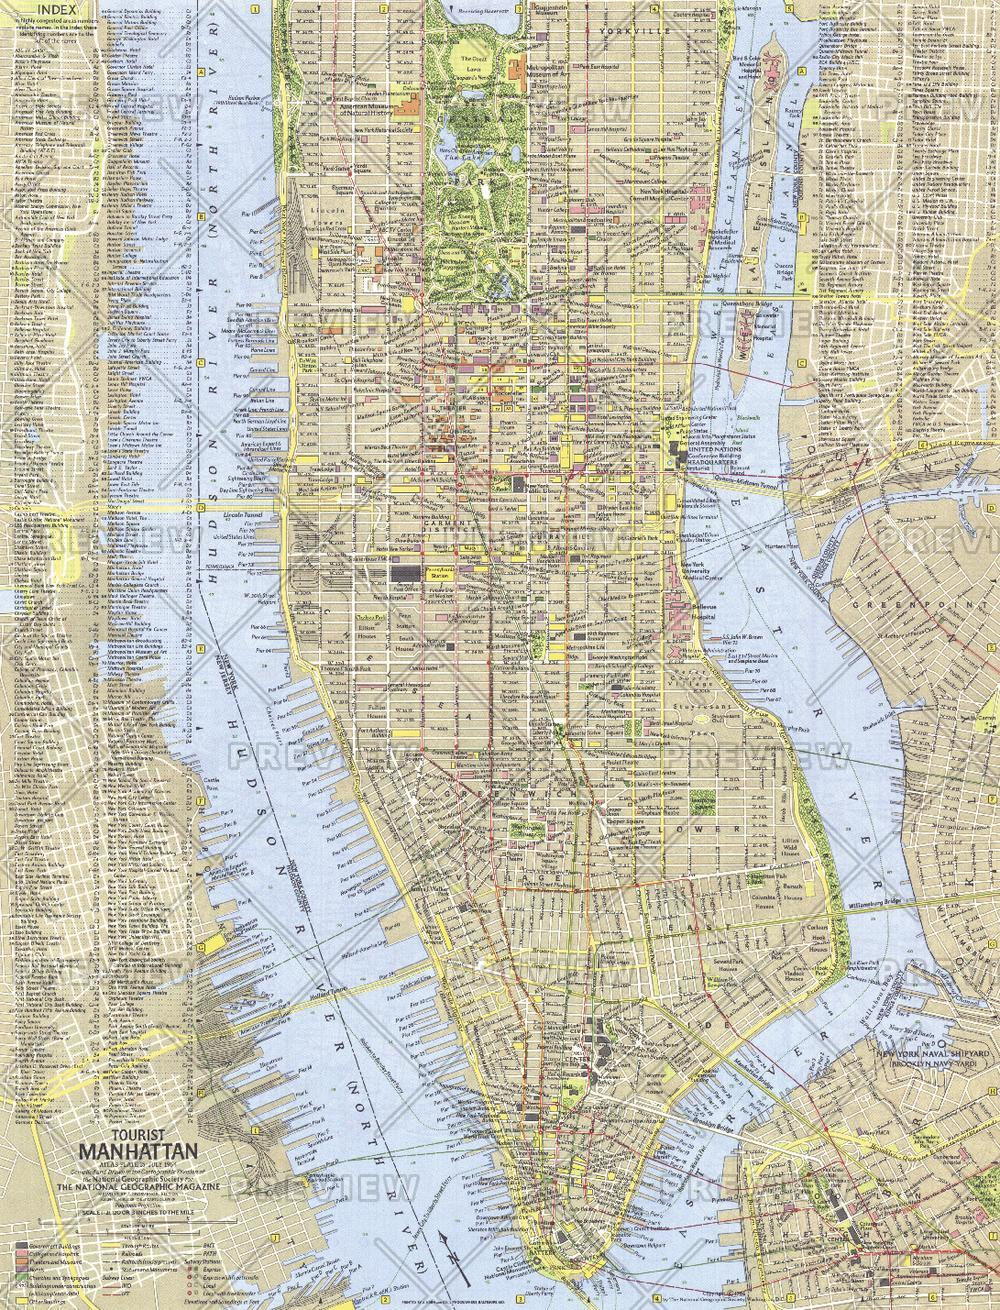 Tourist Manhattan  -  Published 1964